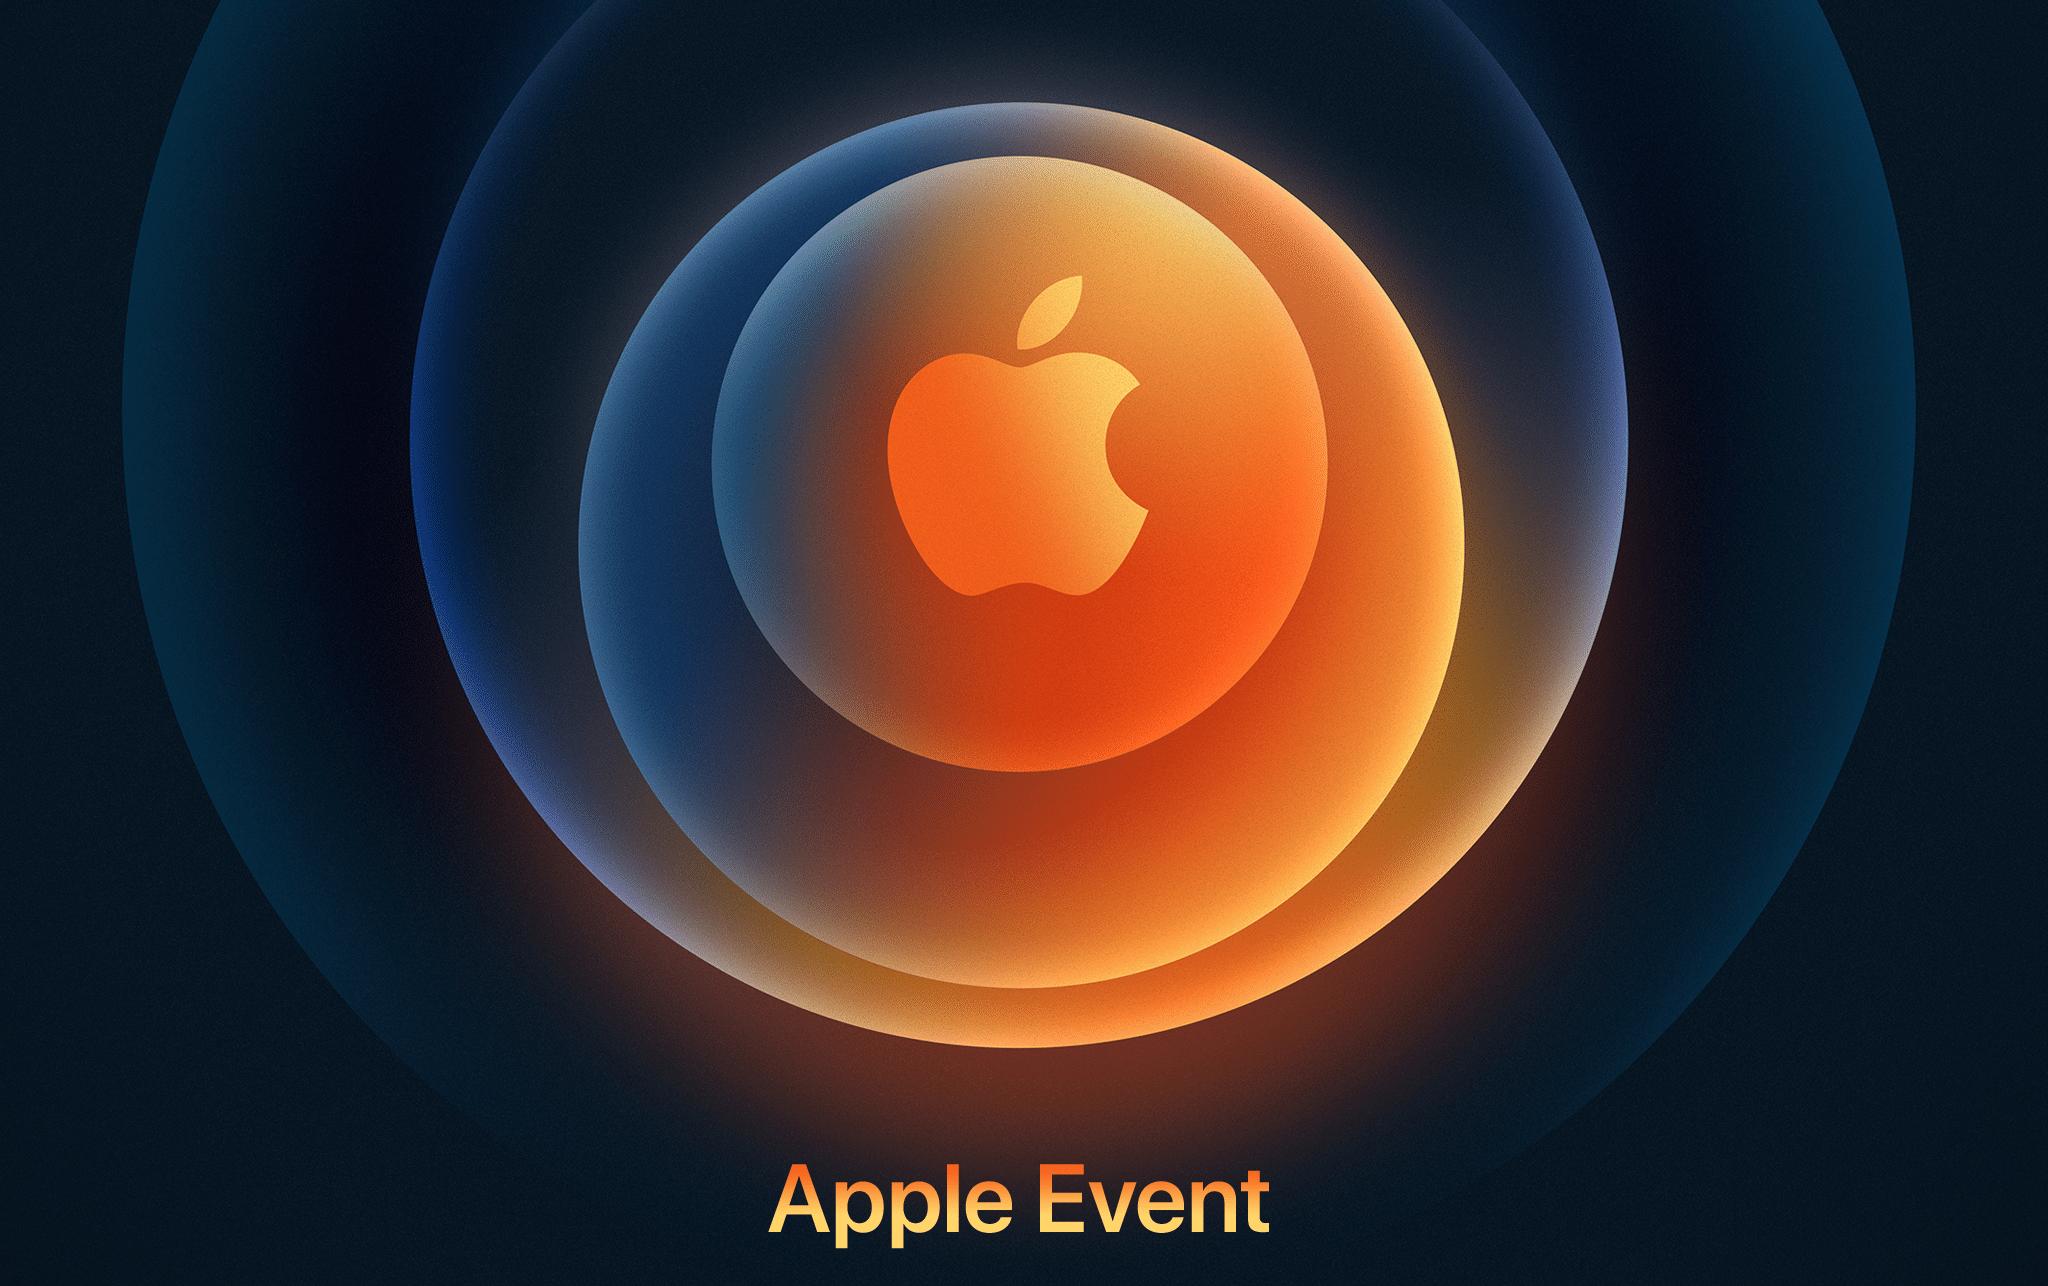 Apple-Event im Oktober 2020